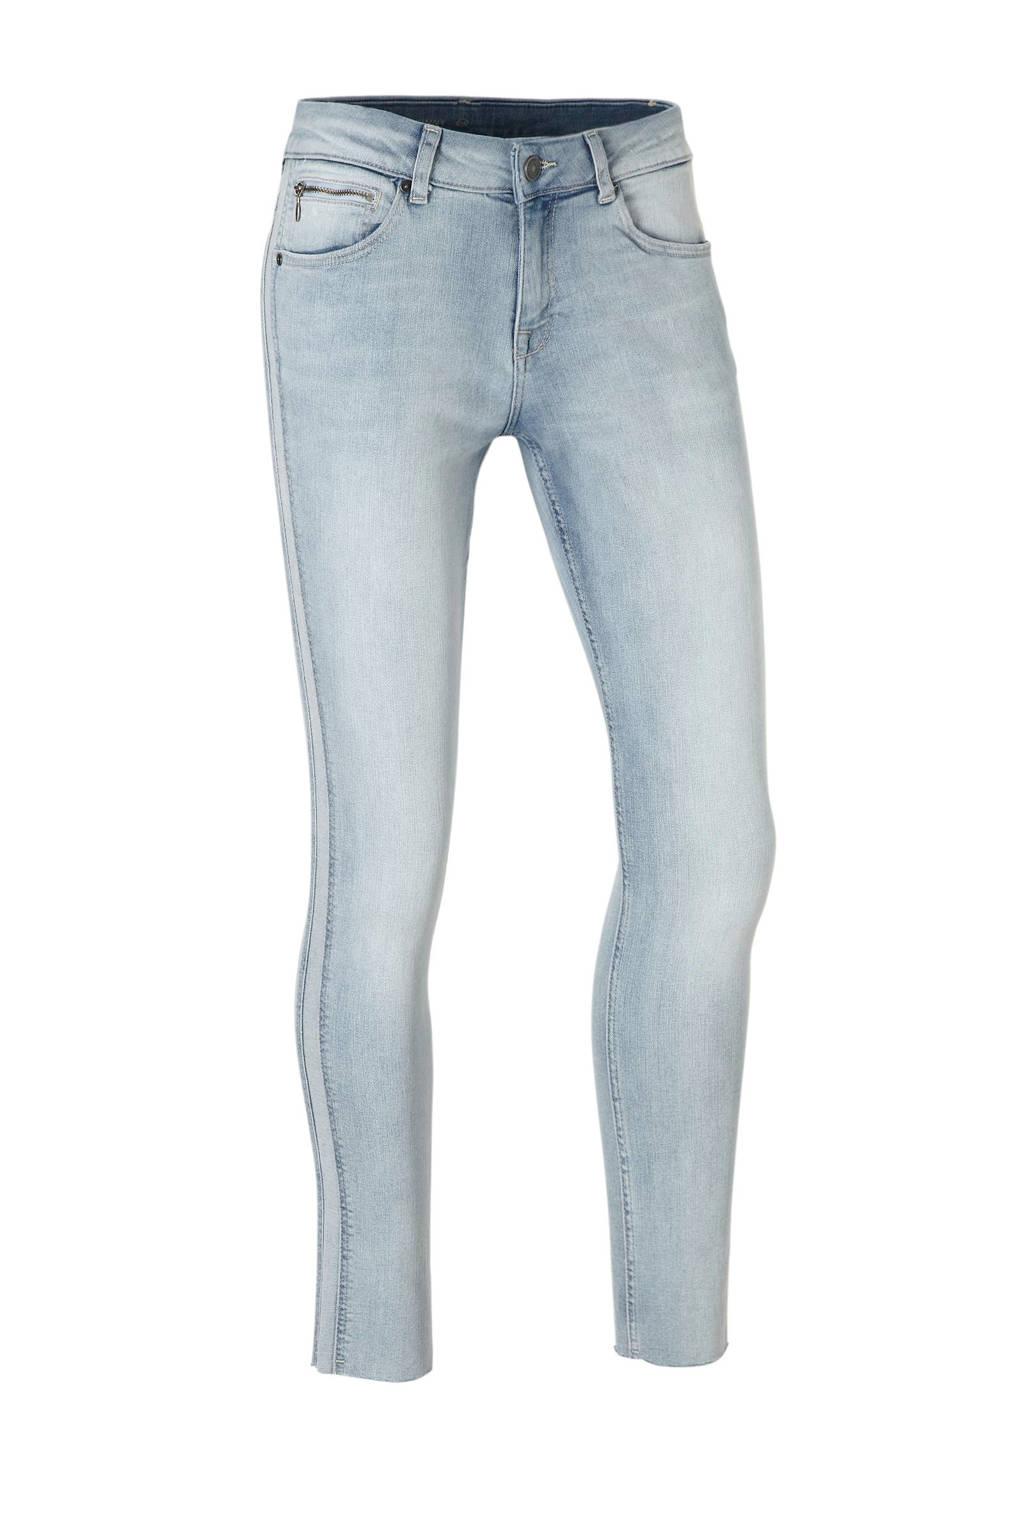 C&A The Denim skinny fit jeans lichtblauw, Lichtblauw